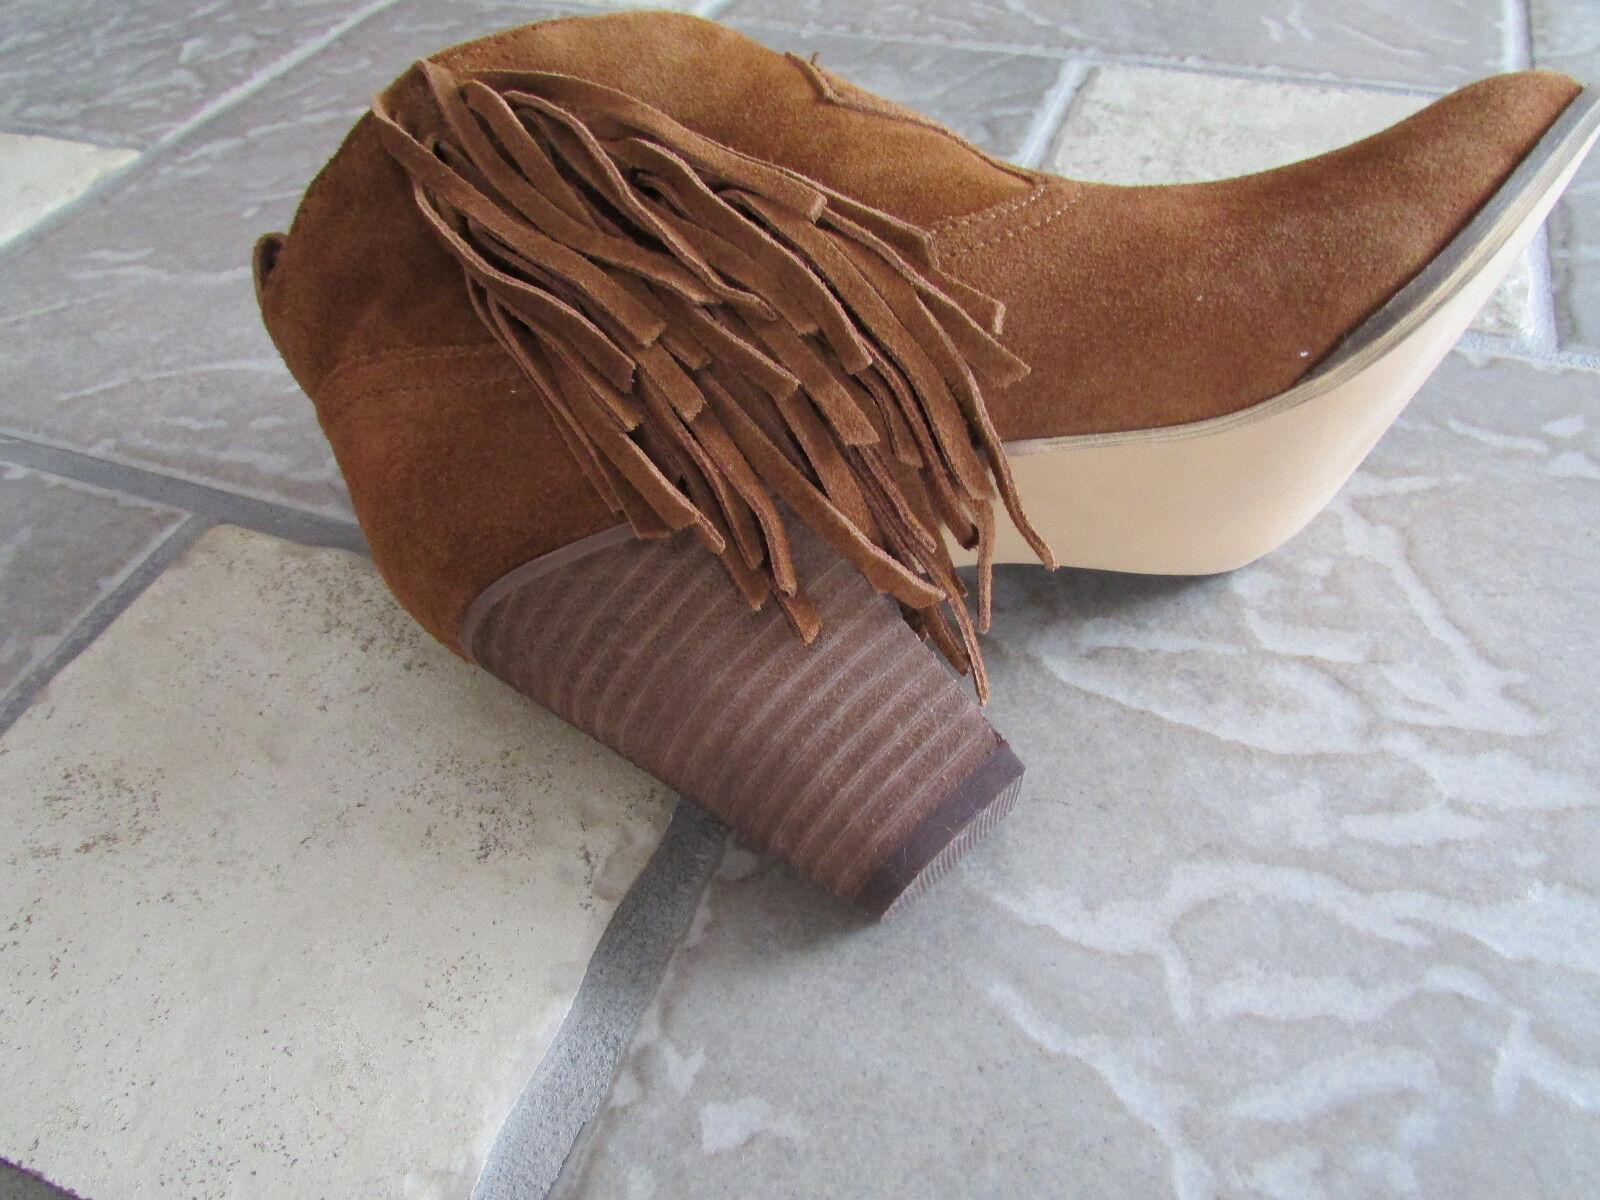 Nuevo Steve Madden Ohio Castaño Gamuza botas al mujer tobillo para mujer al 10 con flecos fc8b27